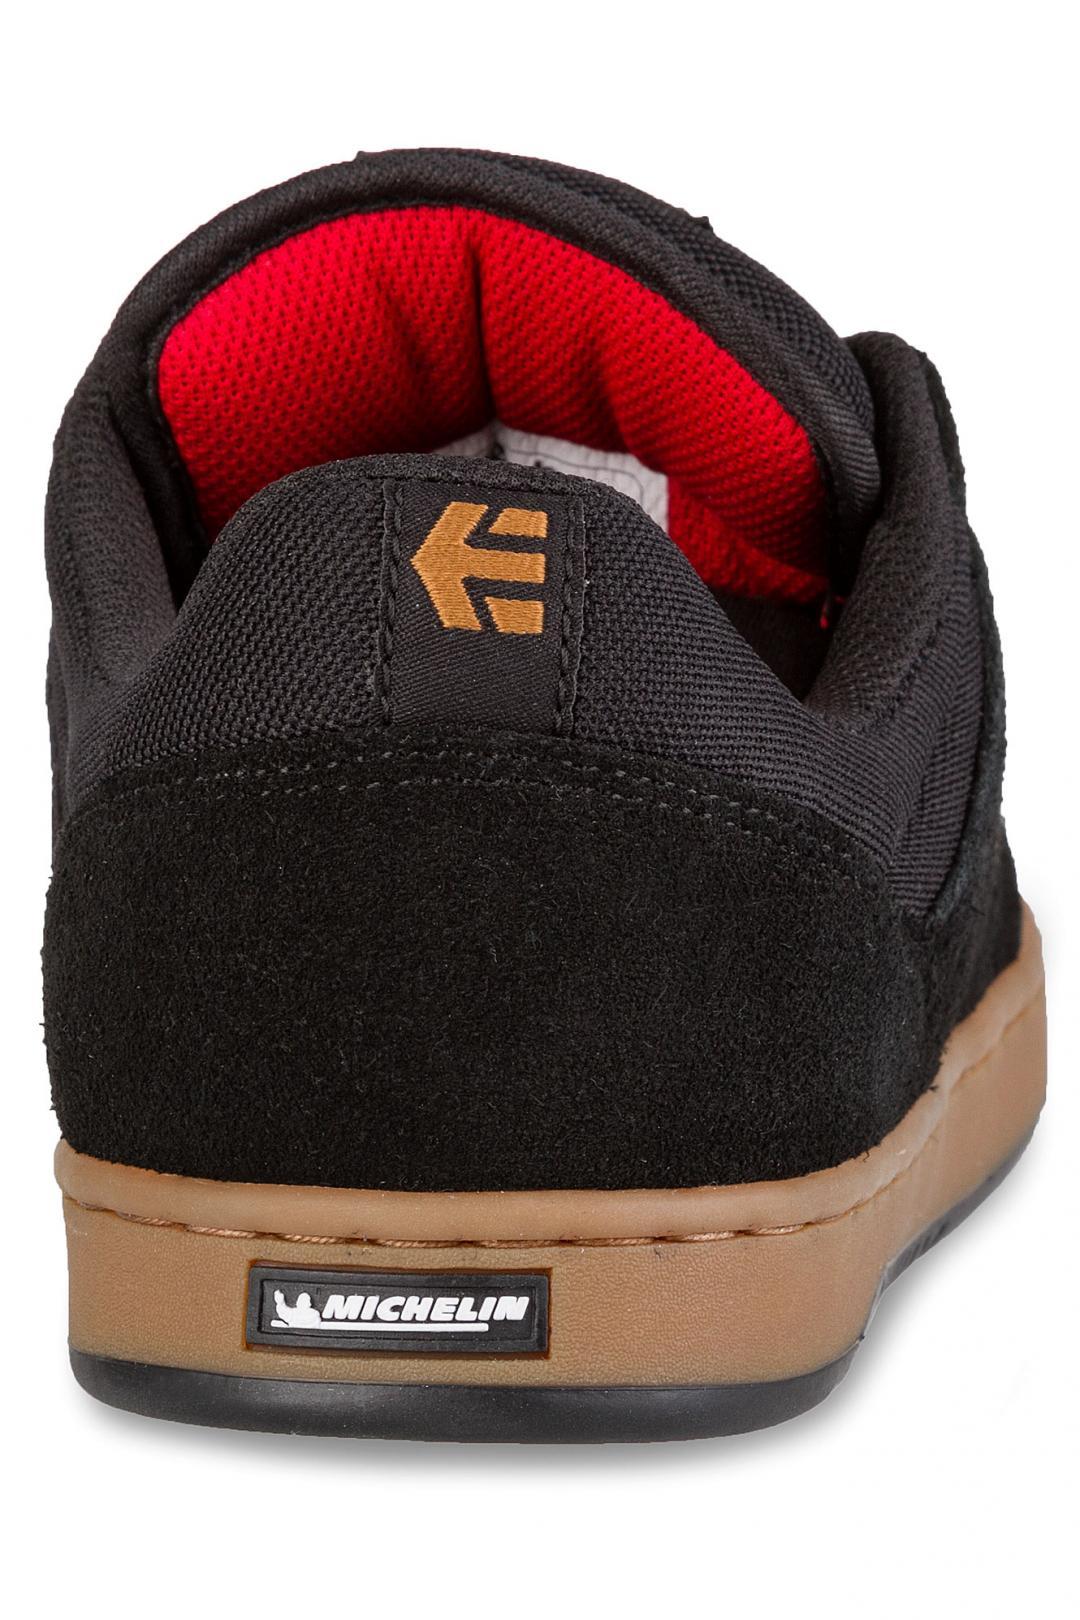 Uomo Etnies Marana x Michelin black red gum | Sneakers low top